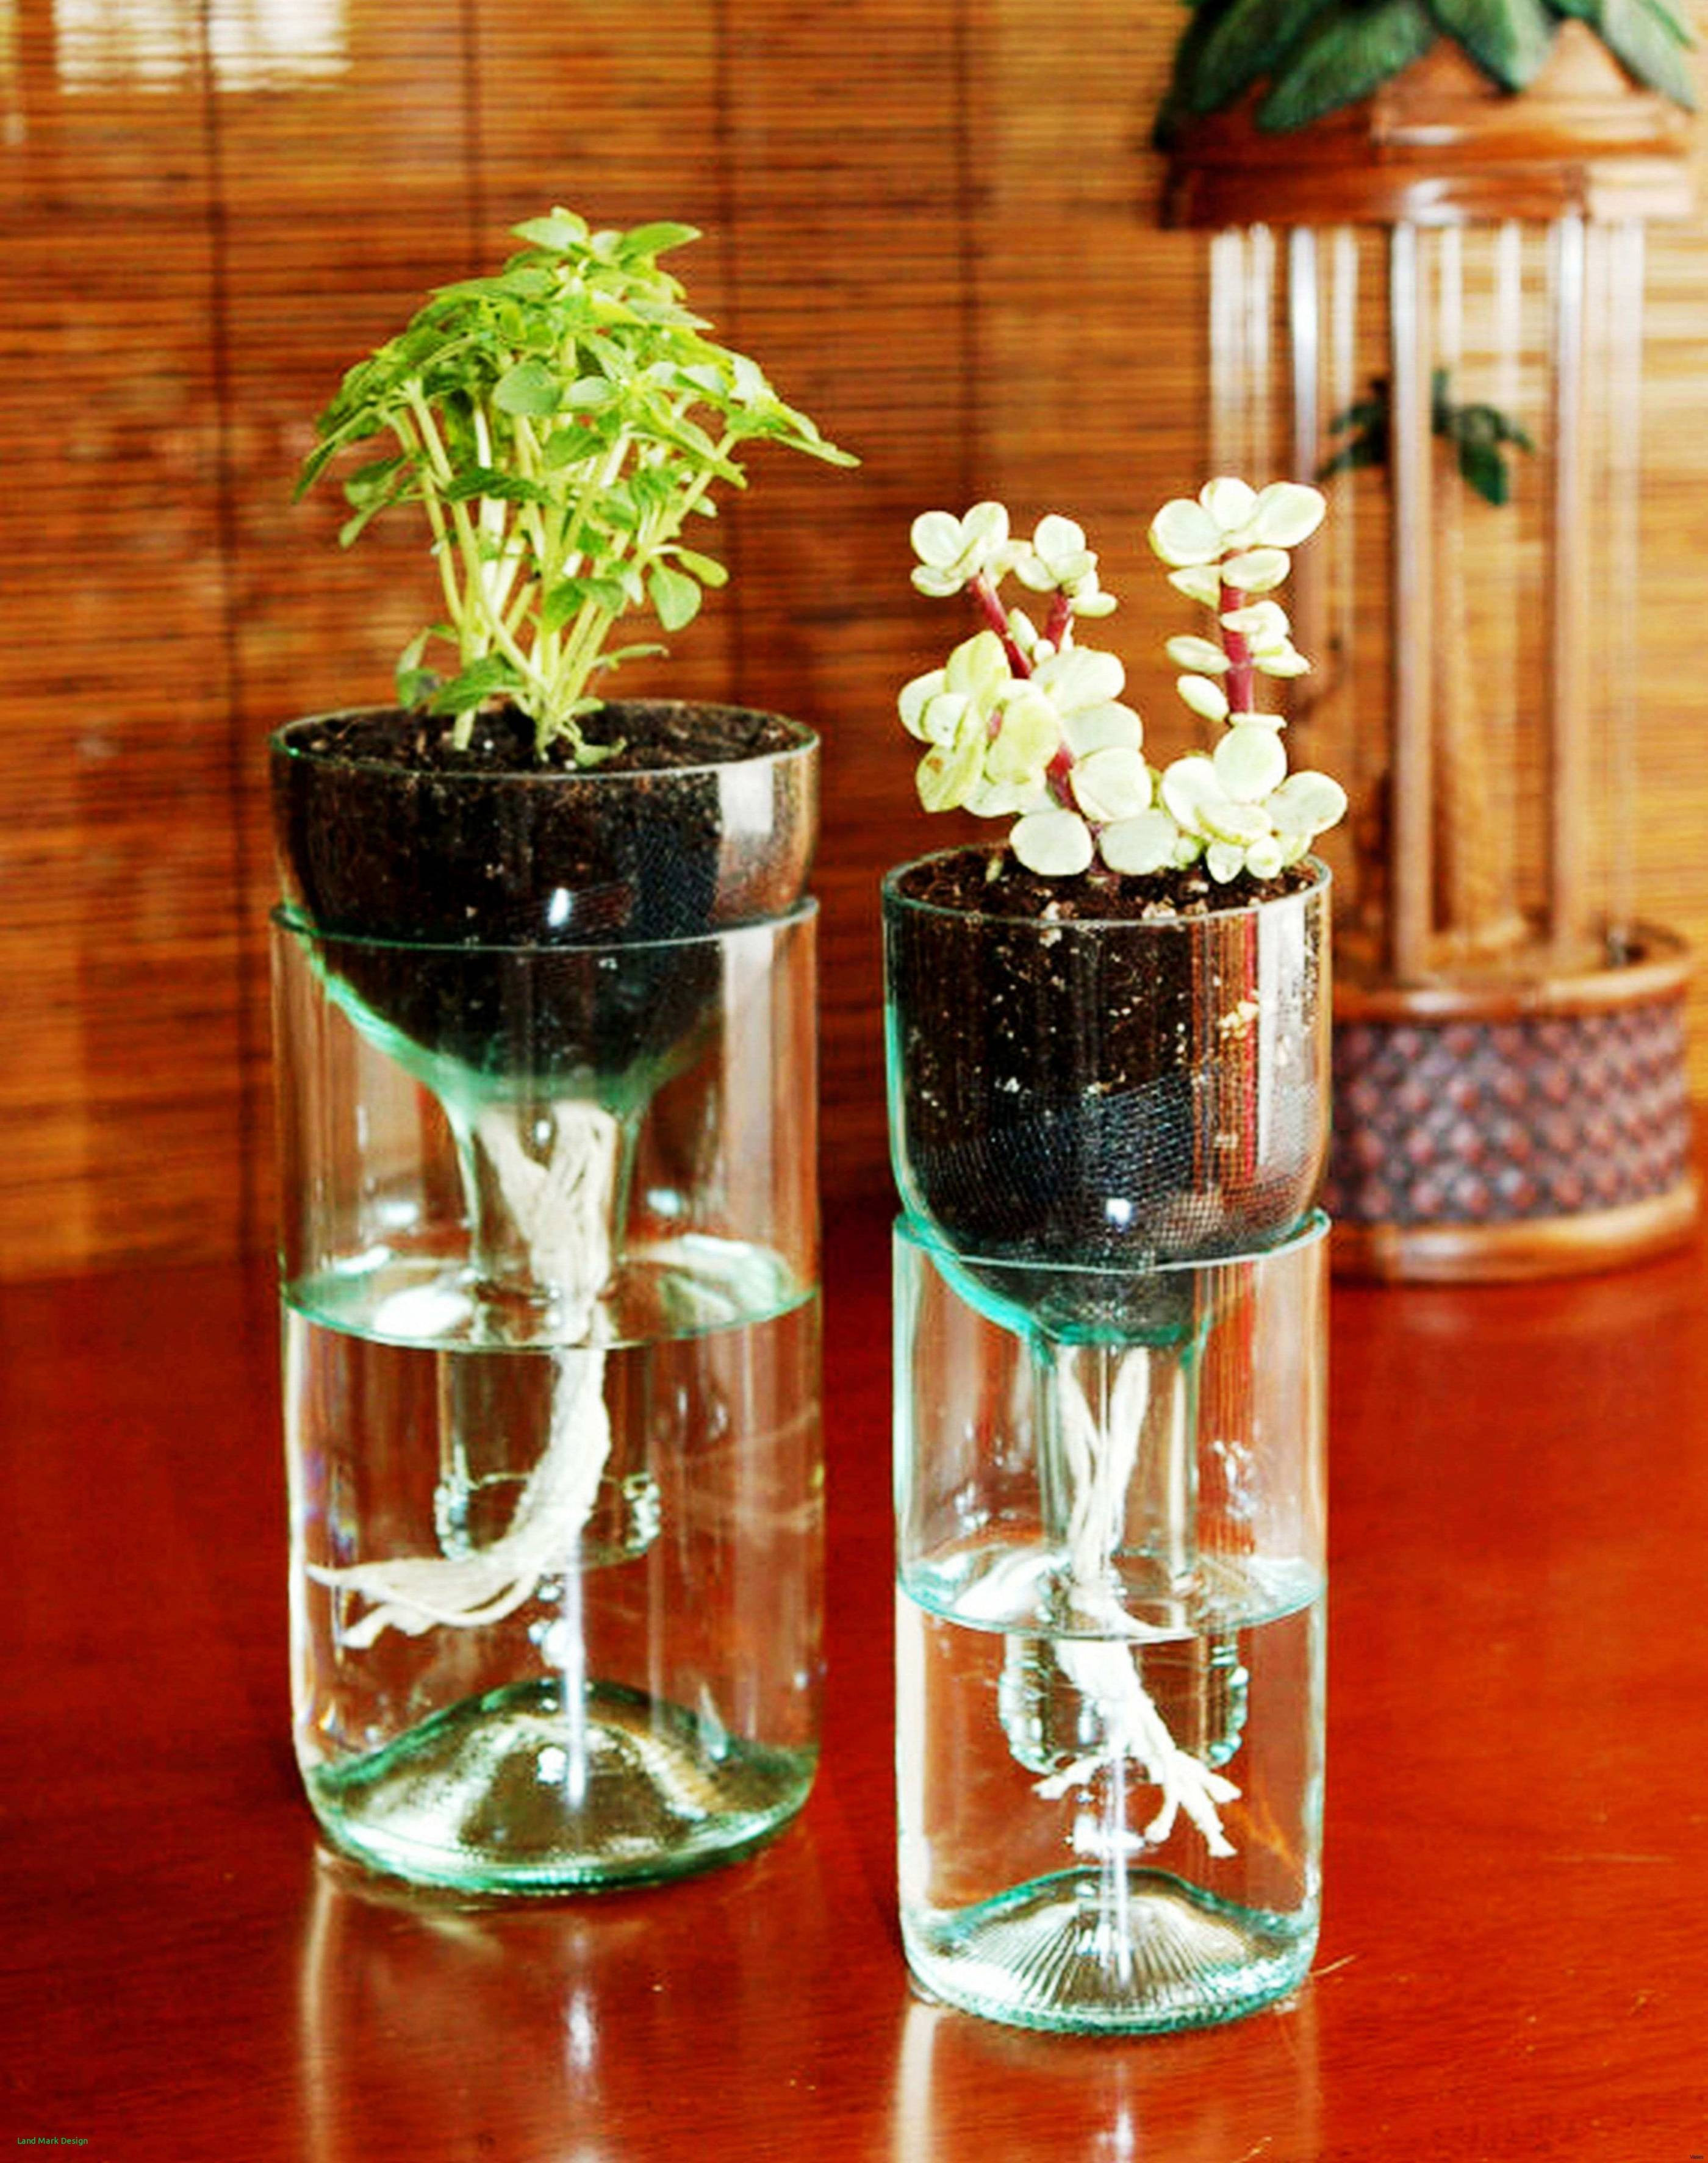 Diy Flower Vase Decoration Of 10 Flower Pot Ideas Favorite for Elegant Room Splusna Com Page In Stunning Flower Vase Decoration Home On Diy Interior Ideas with Homeh Vases Homei 0d